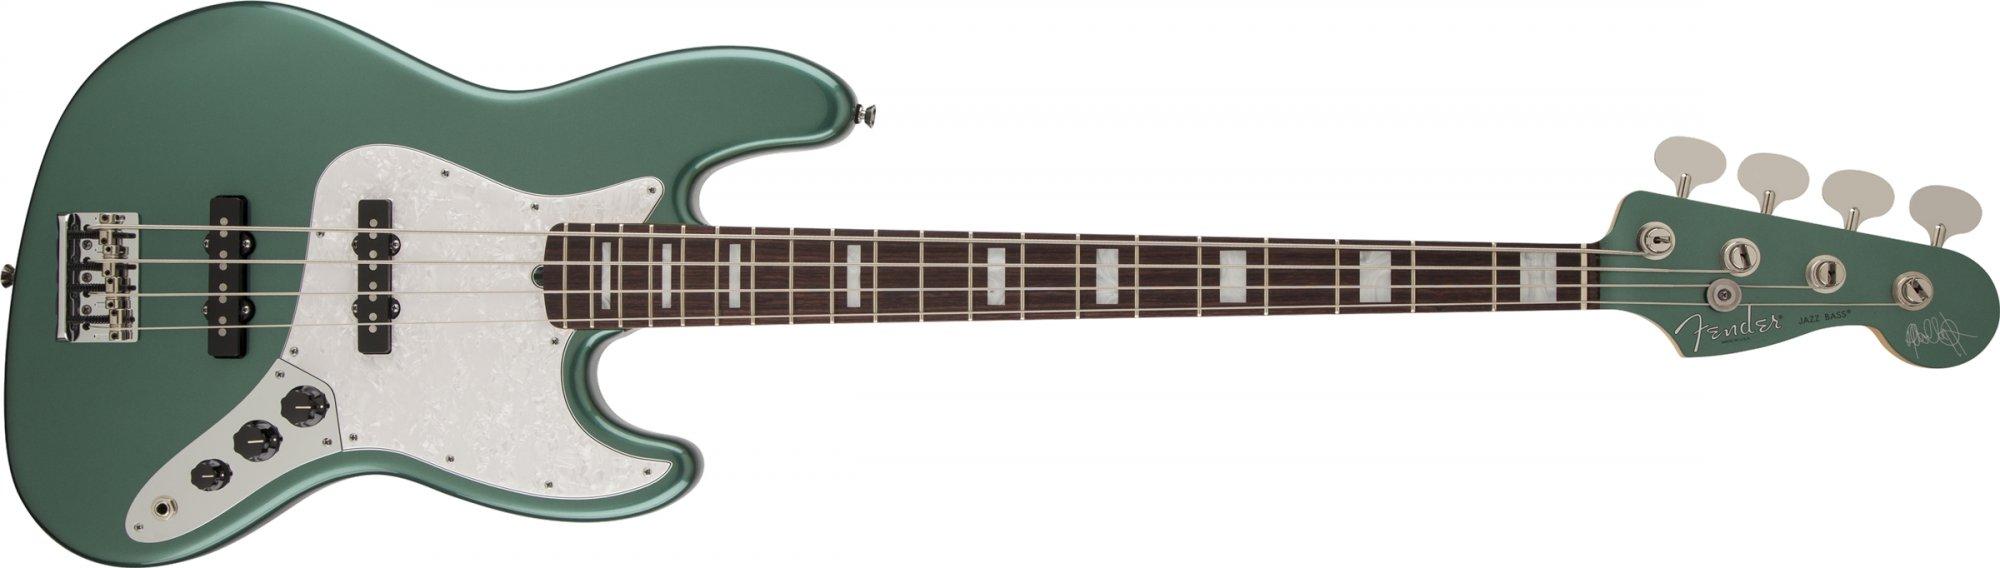 Fender Adam Clayton Jazz Bass Sherwood Green